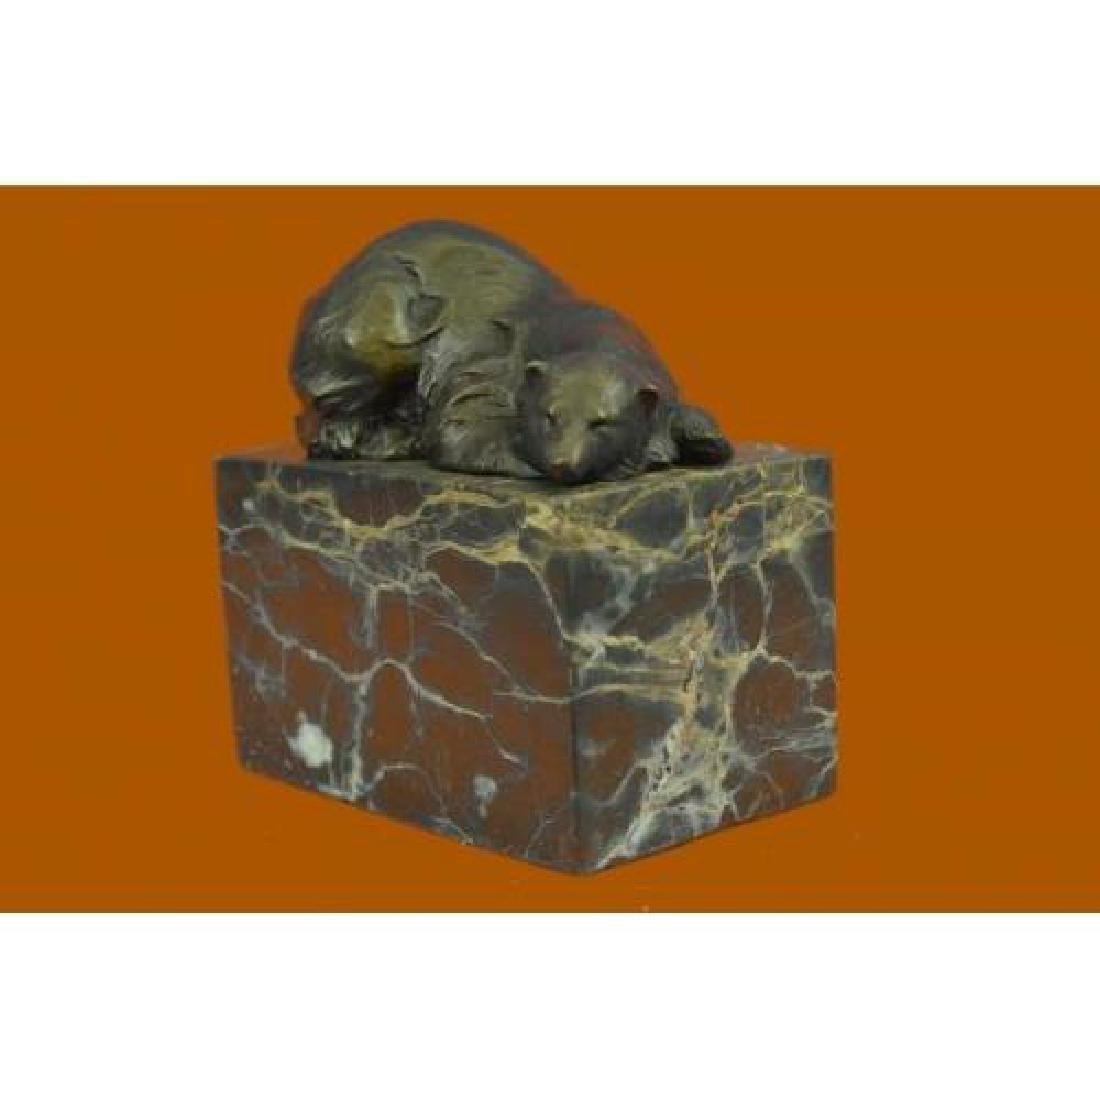 Polar Bear Bronze Sculpture on Marble Base Sculpture - 2